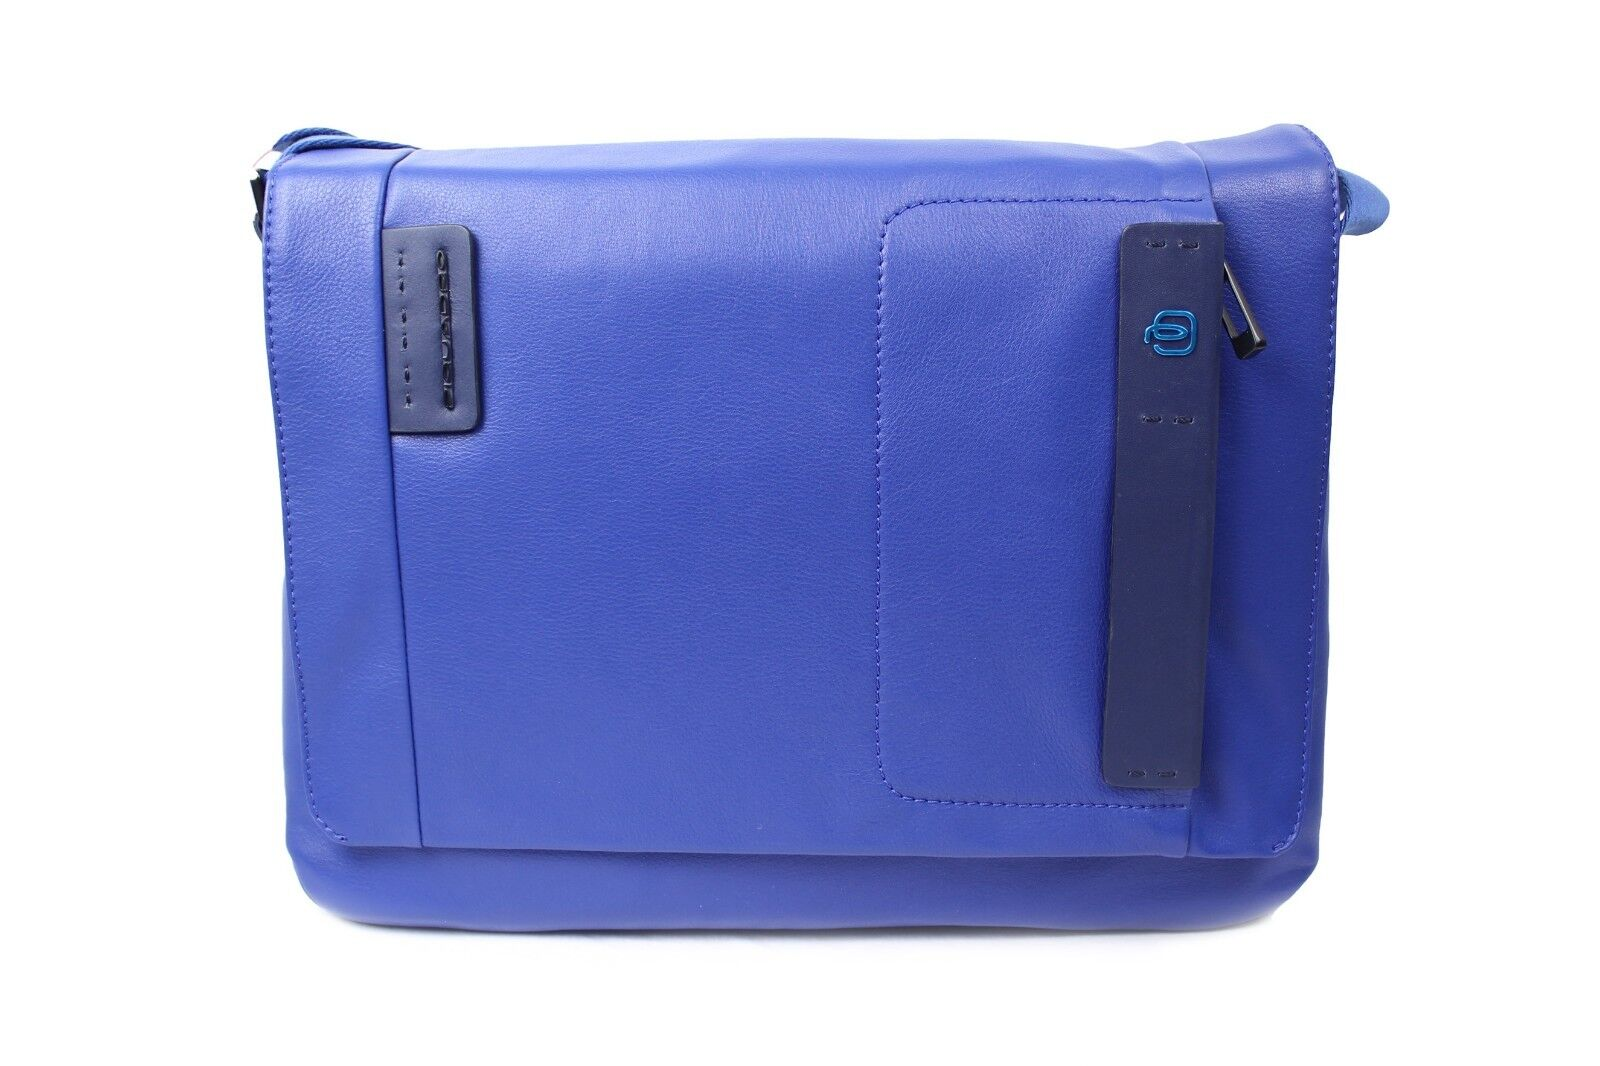 Piquadro Umhängetasche,(blau) - CA3348P15 Blau Unisex 27x37x7cm (HxBxT) | Das hochwertigste Material  | Neuartiges Design  | Merkwürdige Form